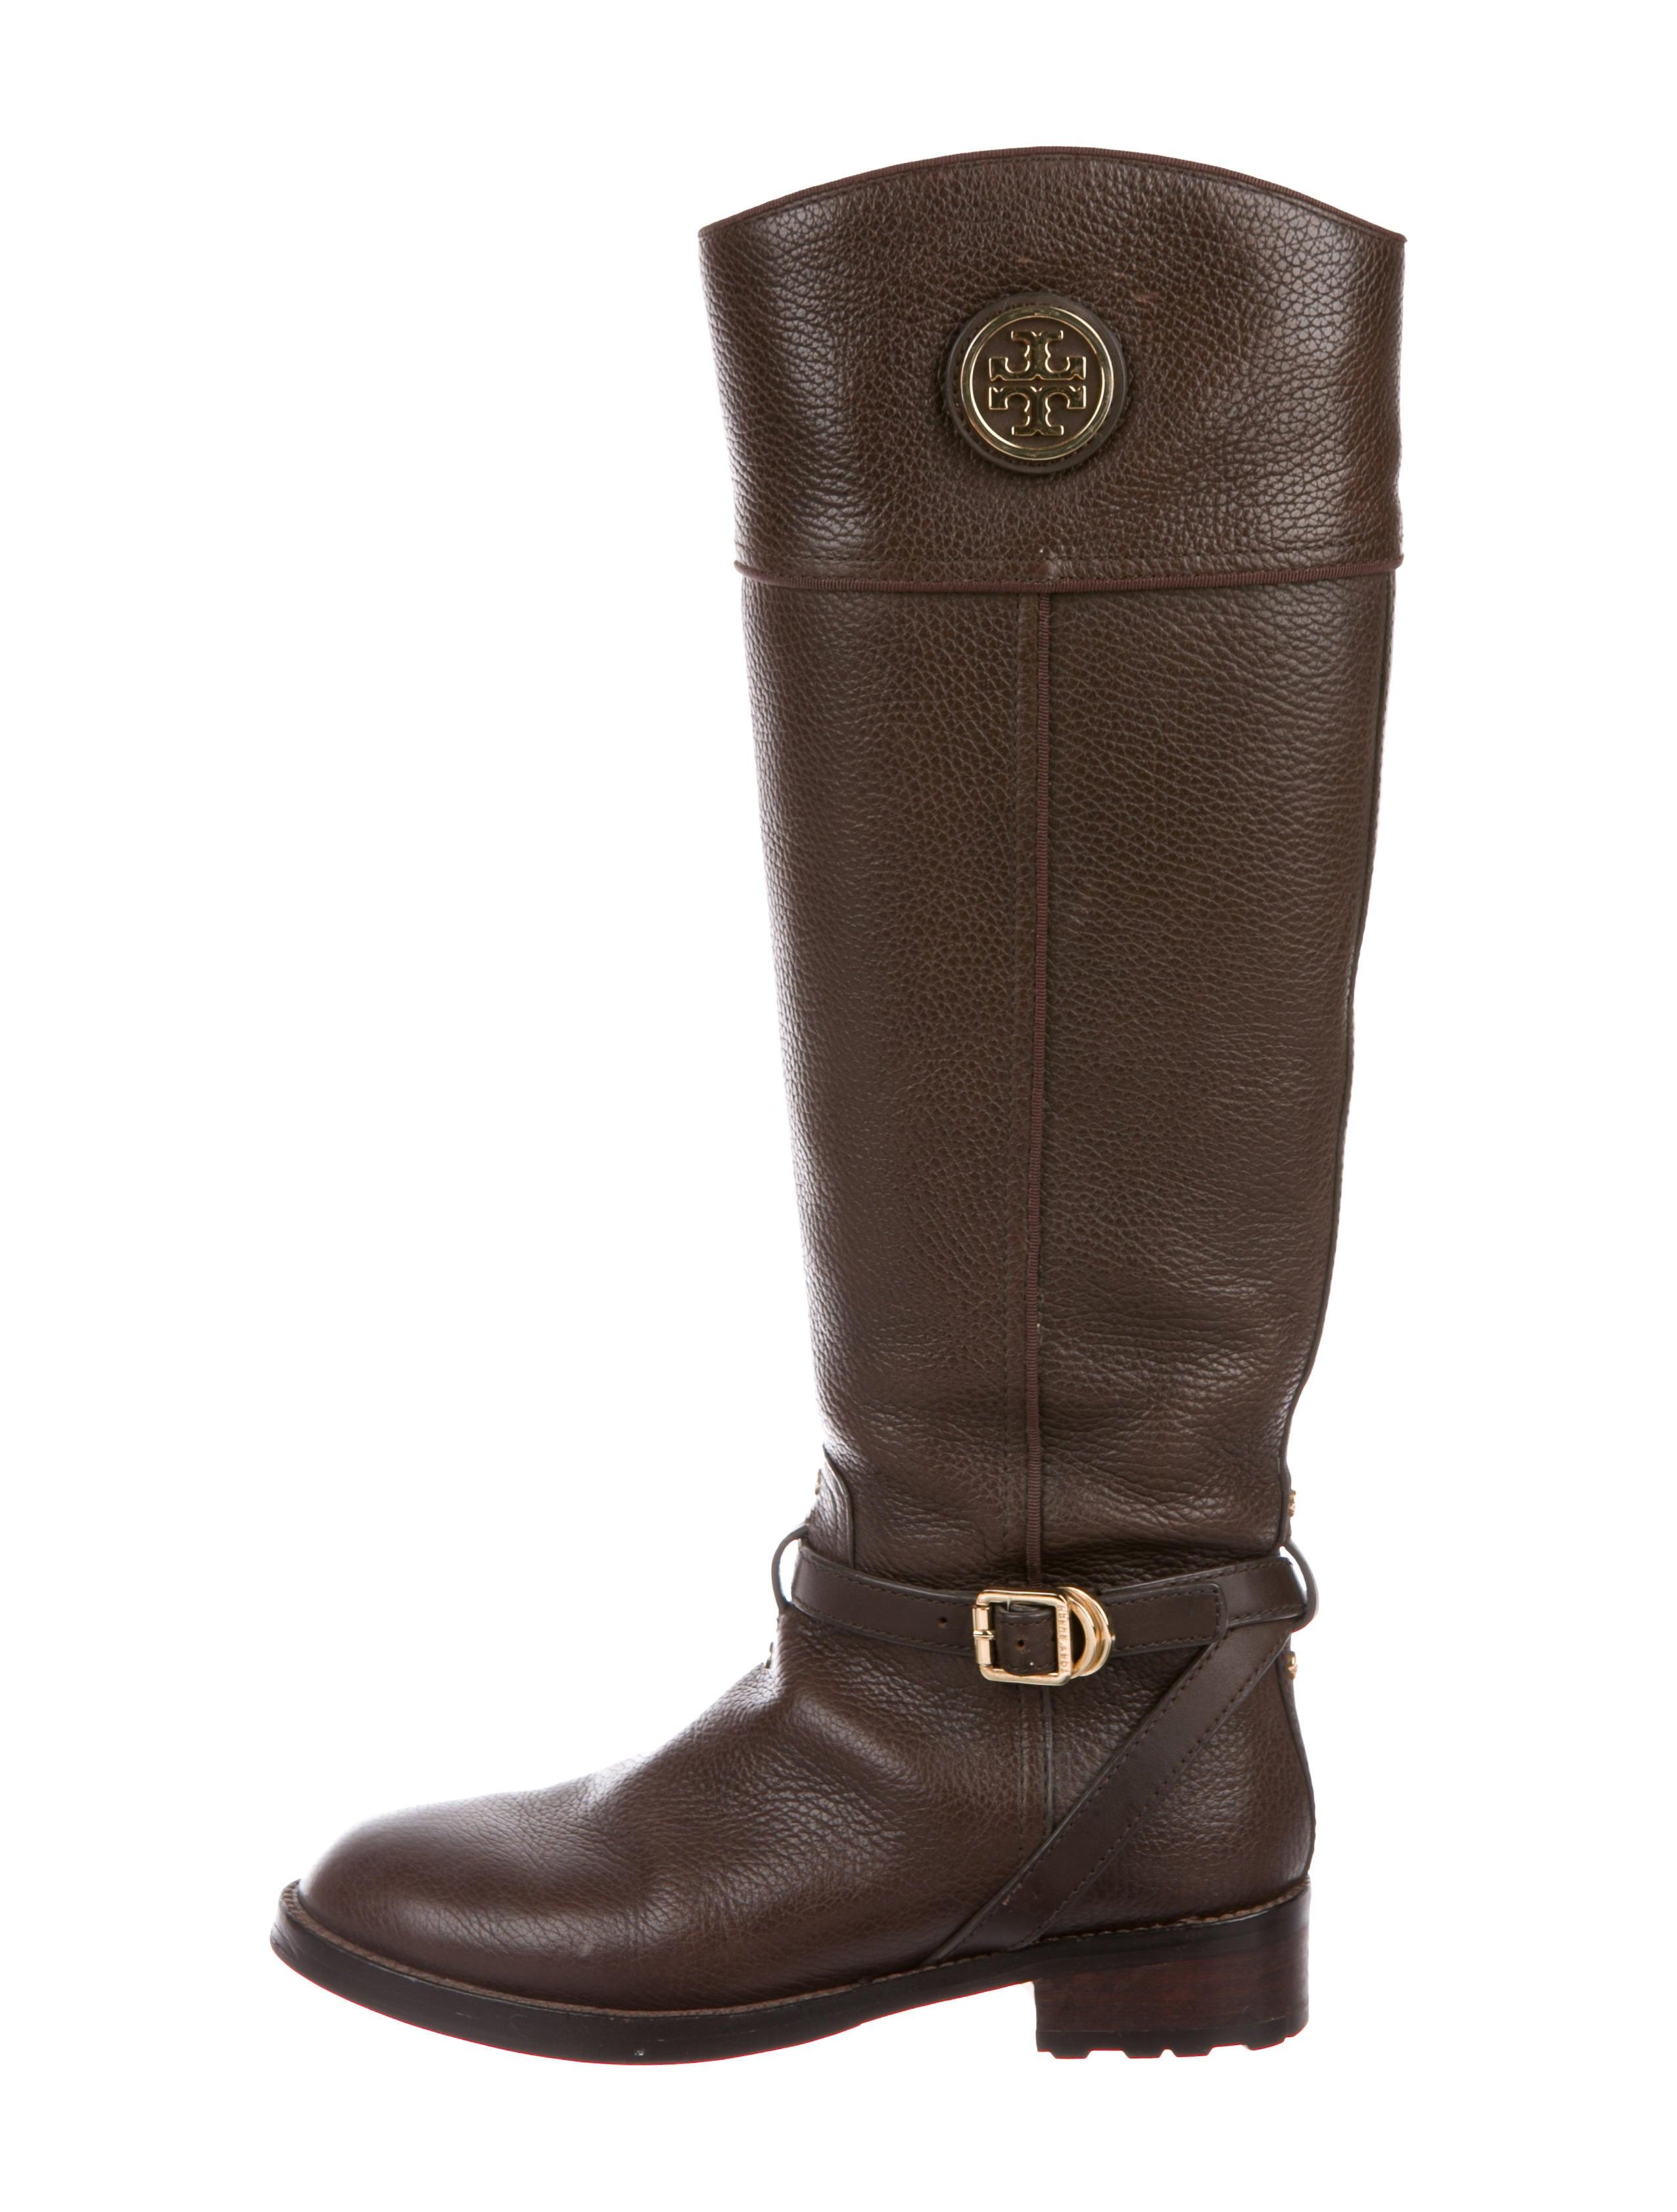 Tory Burch Teresa Knee-High Boots clearance visit outlet 100% original HVEKEd5